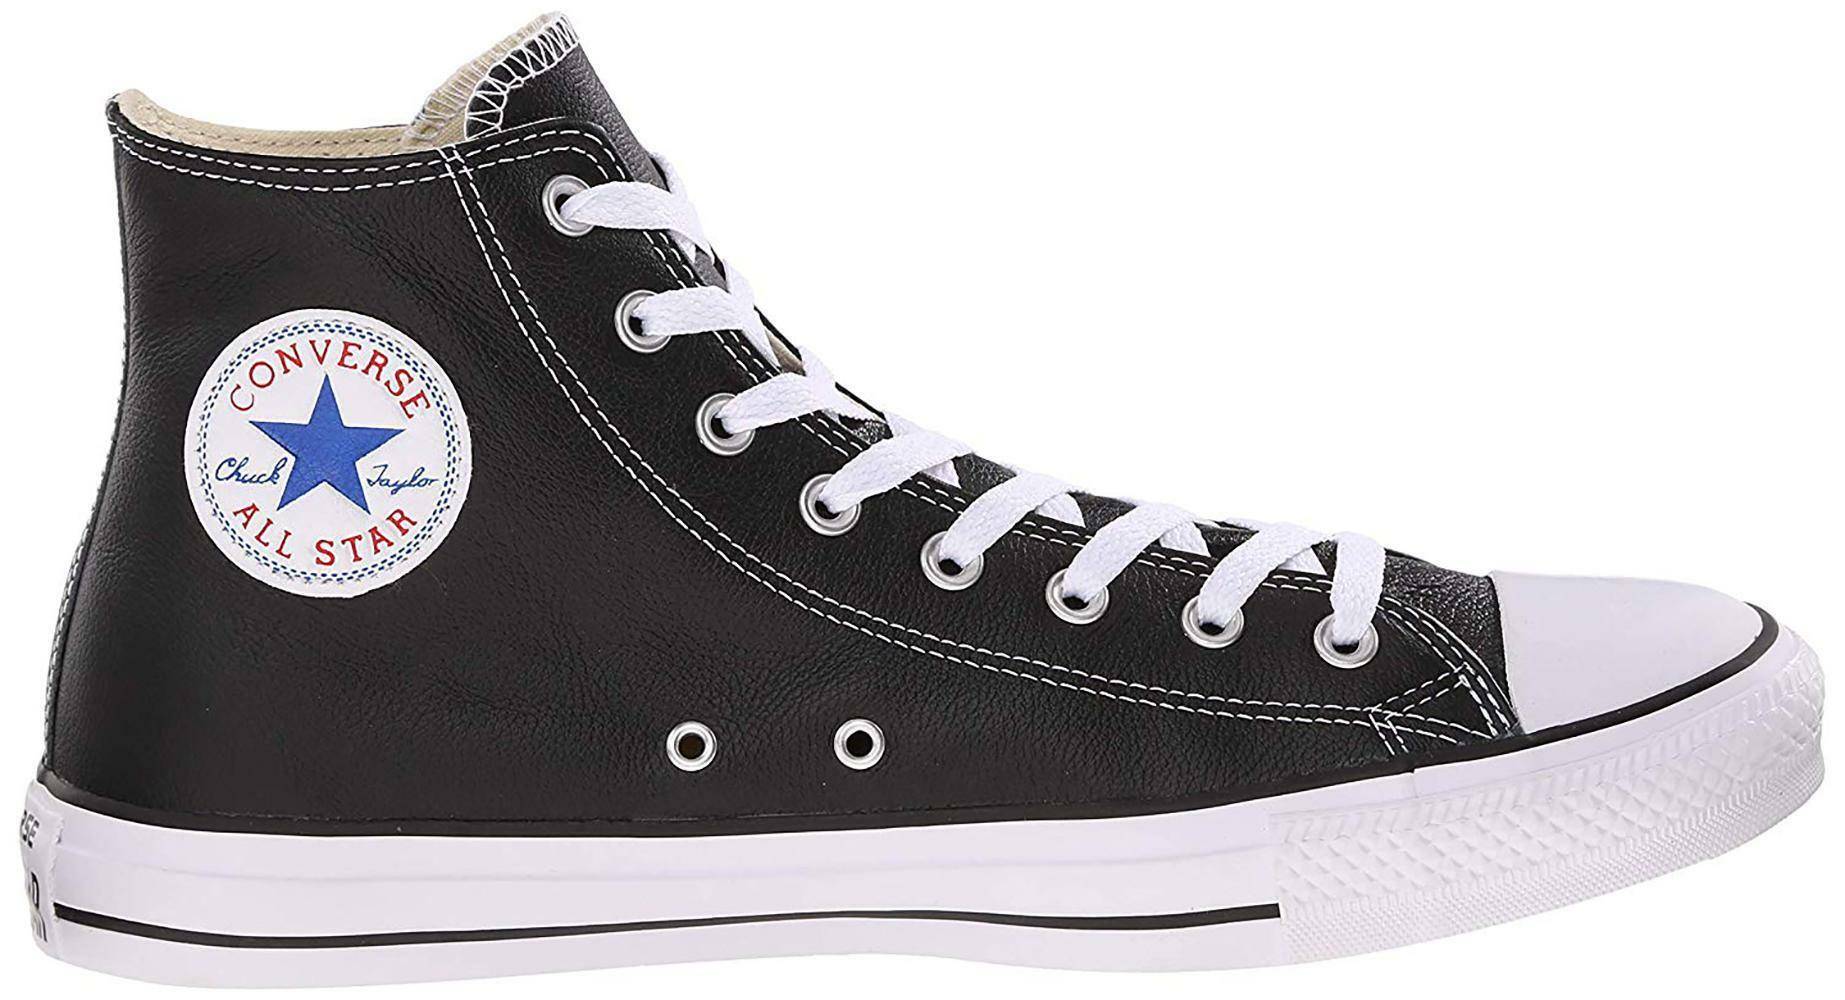 converse converse all star scarpa sneaker alta hi nera black pelle ltr 132170c